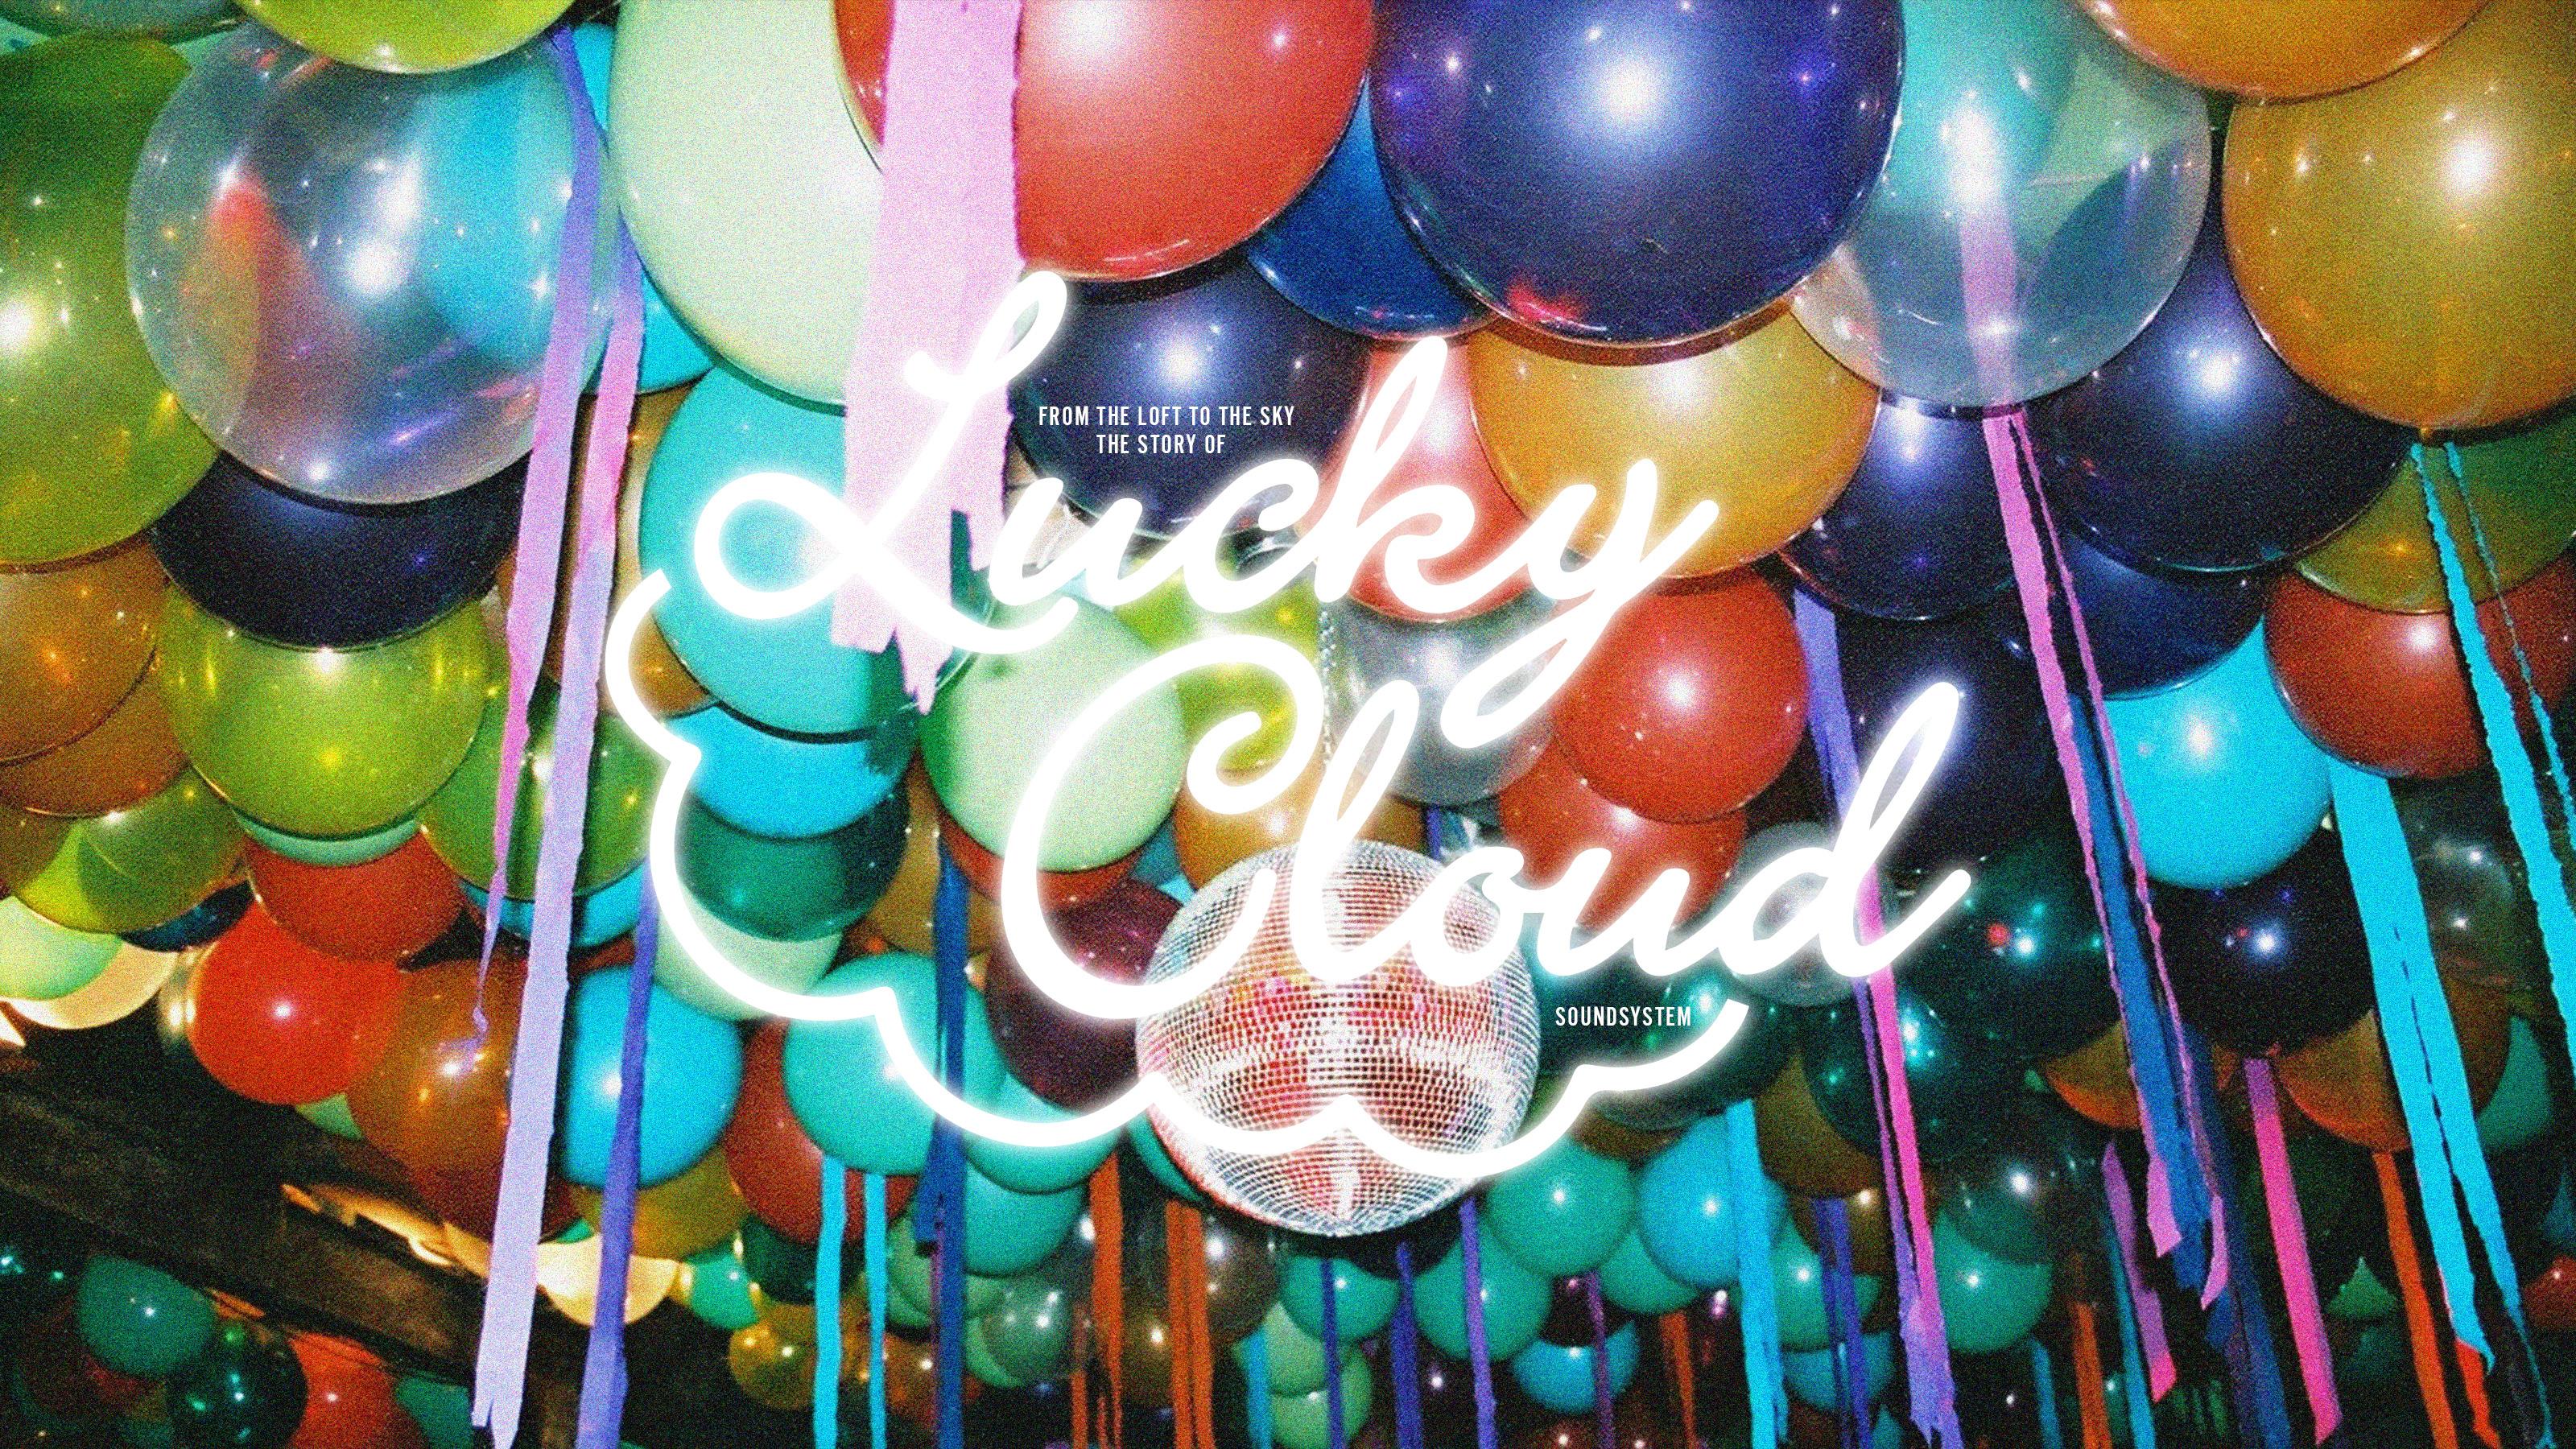 The Loftから天空へ: Lucky Cloud Soundsystemのストーリー